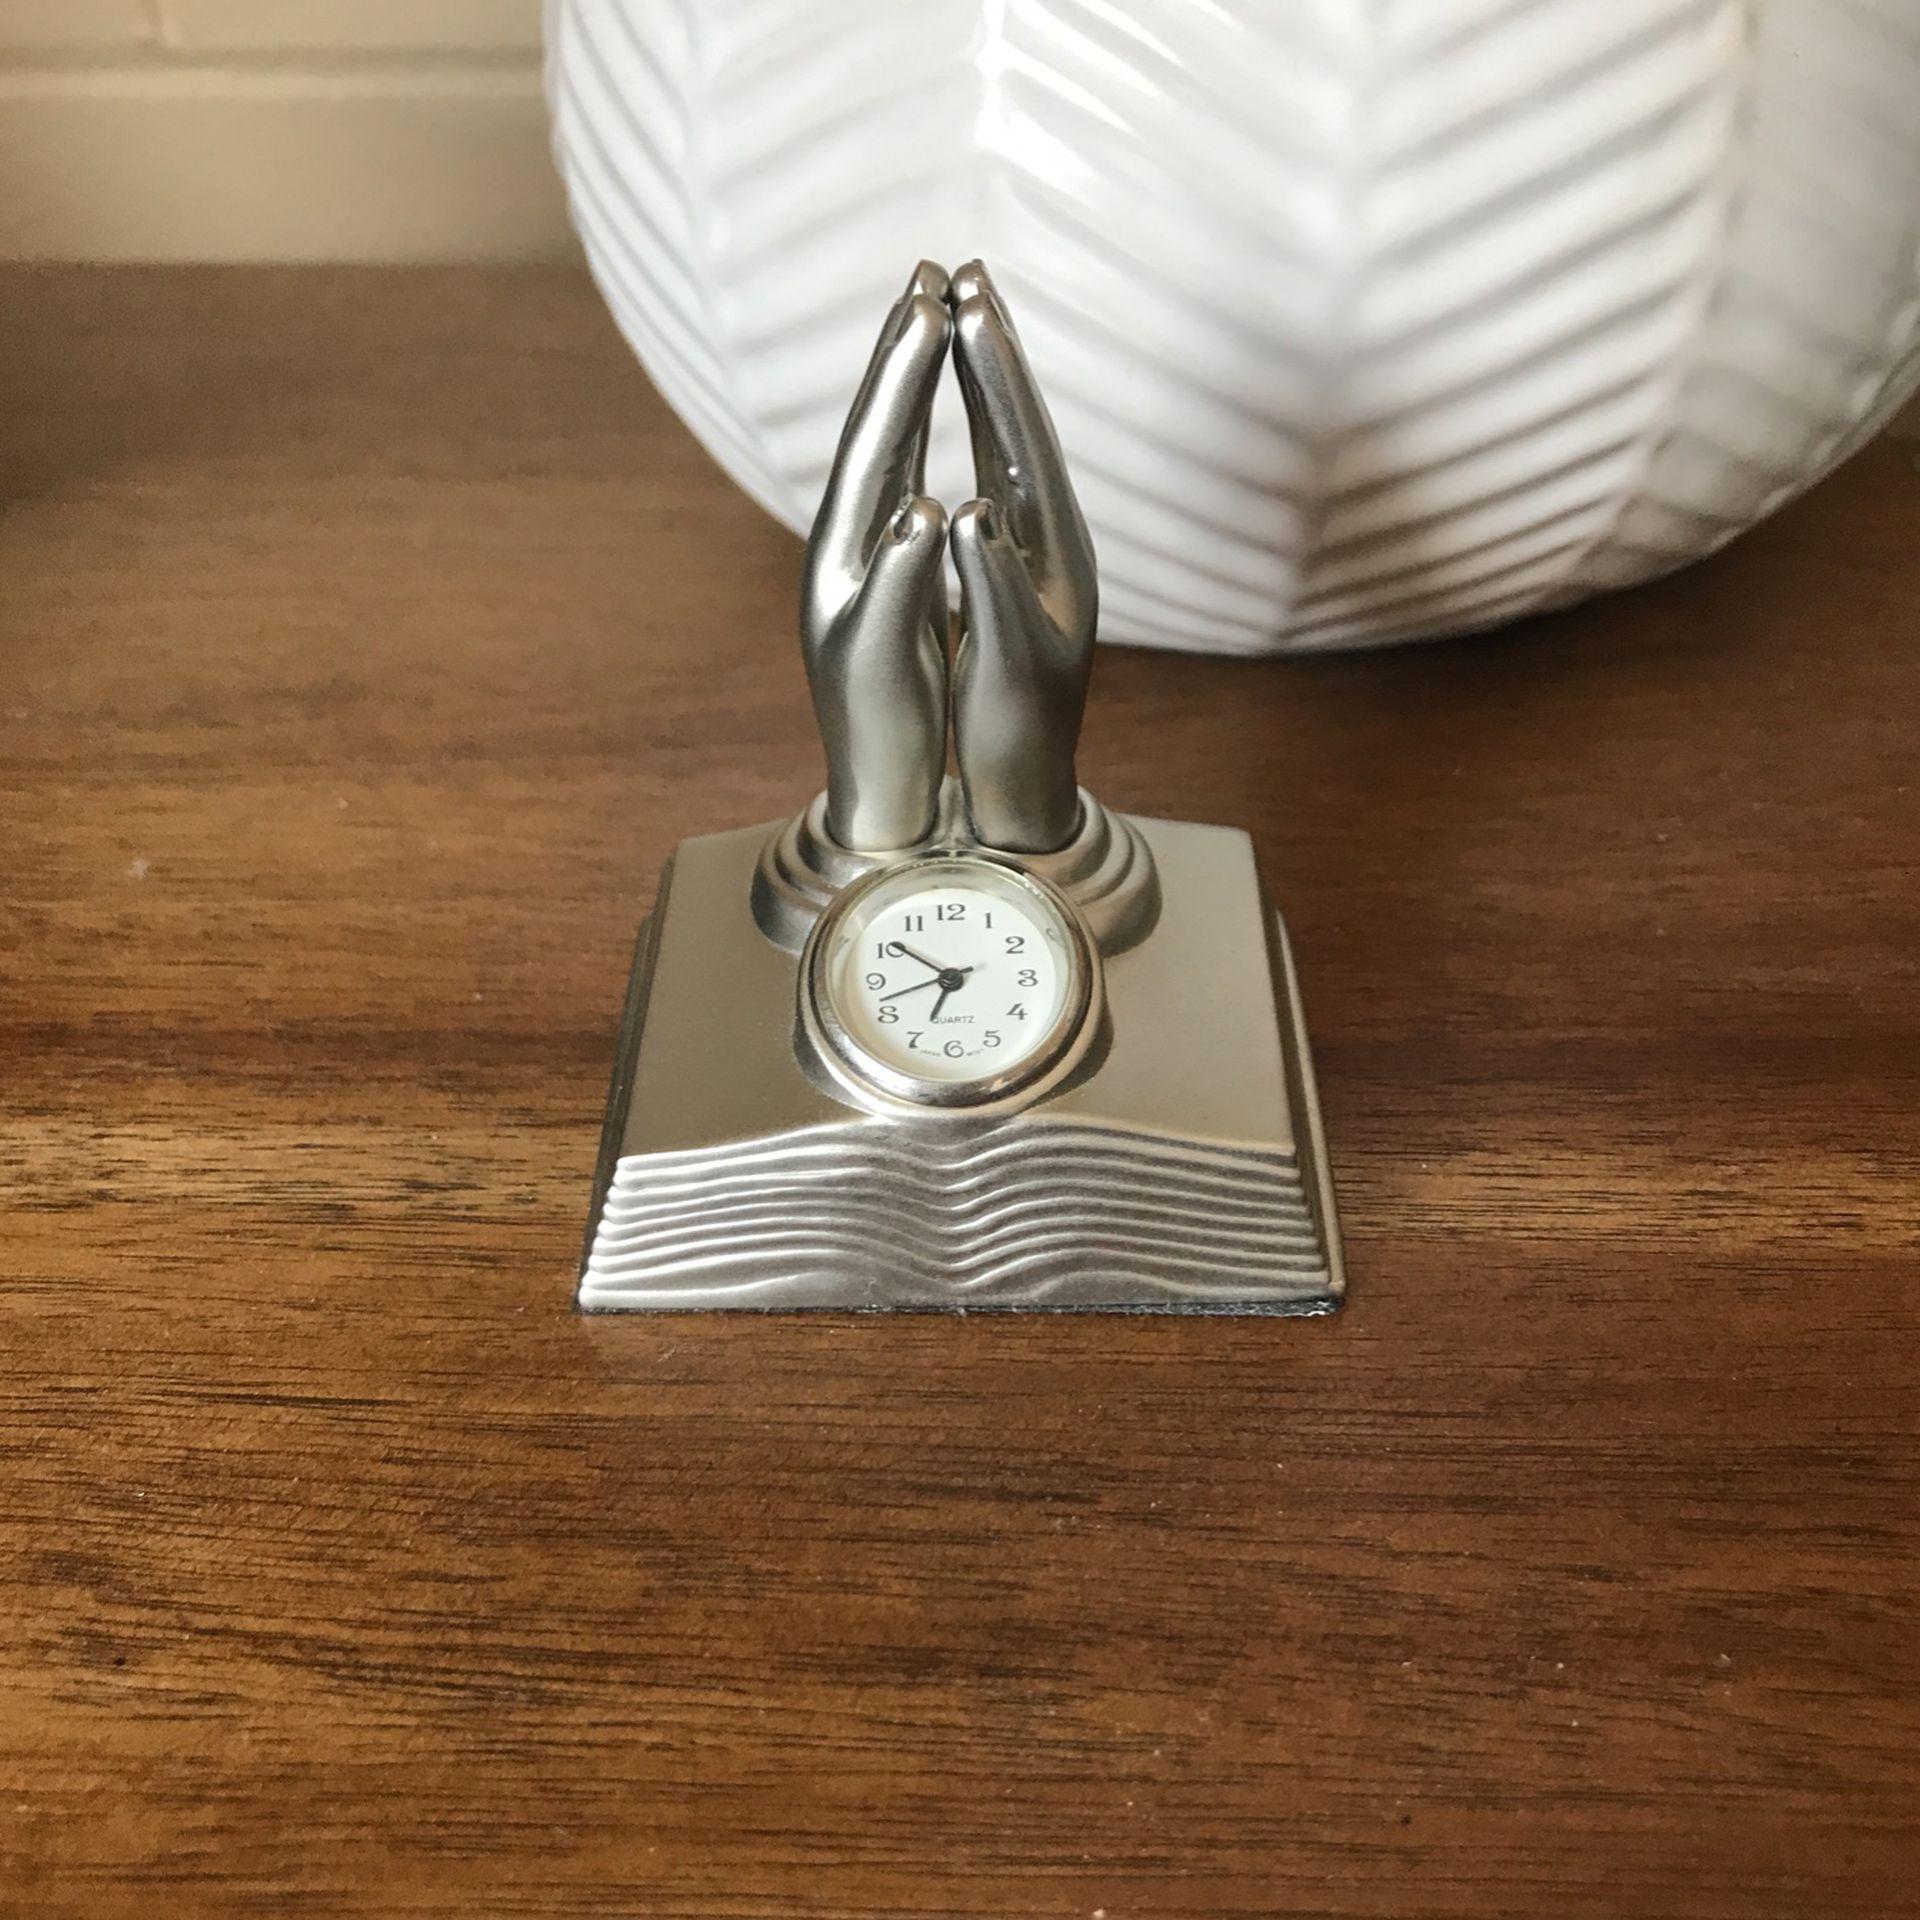 Prayer Clock - Small, Desk/Nightstand, Gift